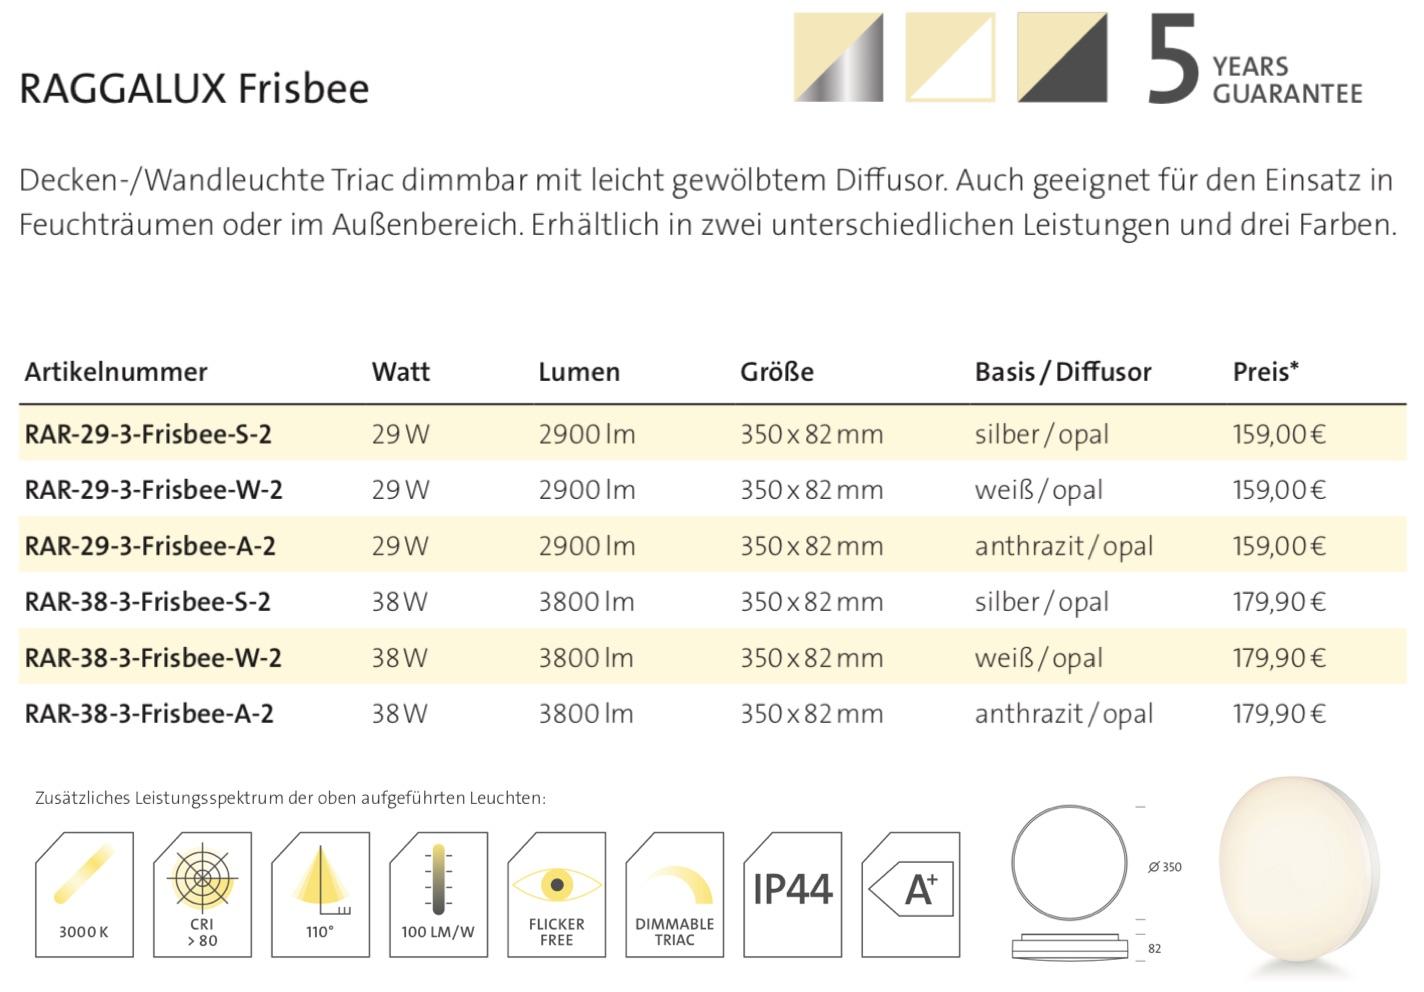 Raggalux Frisbee Datenblatt